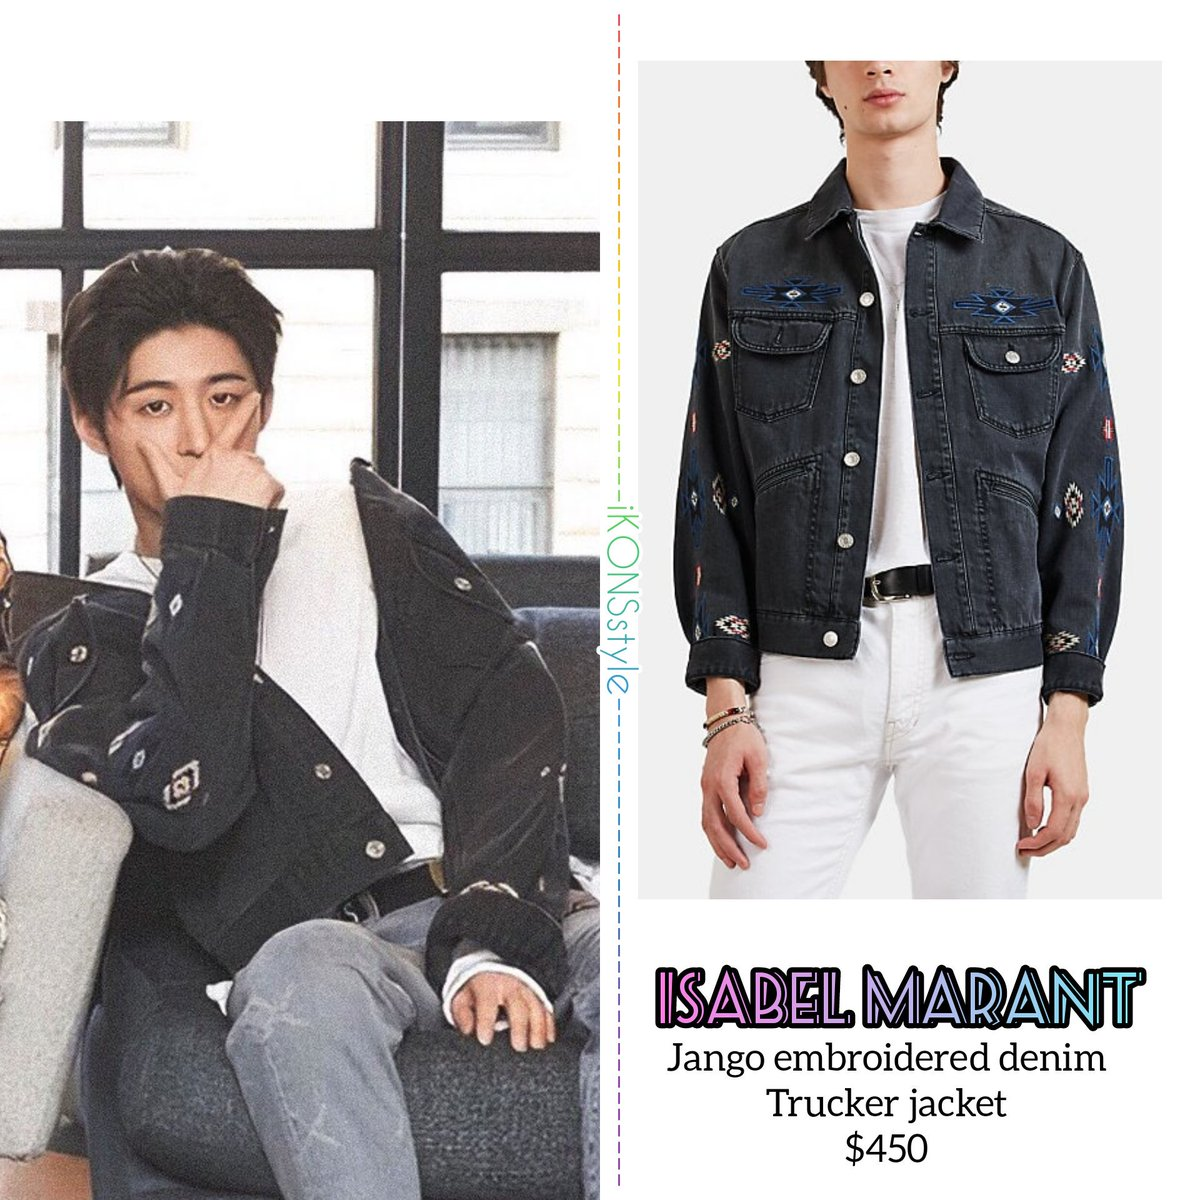 9d4f82f8d9a 《HANBIN》 SXSW Festival ☆Isabel Marant •Jango embroidered denim trucker  Jacket • 450